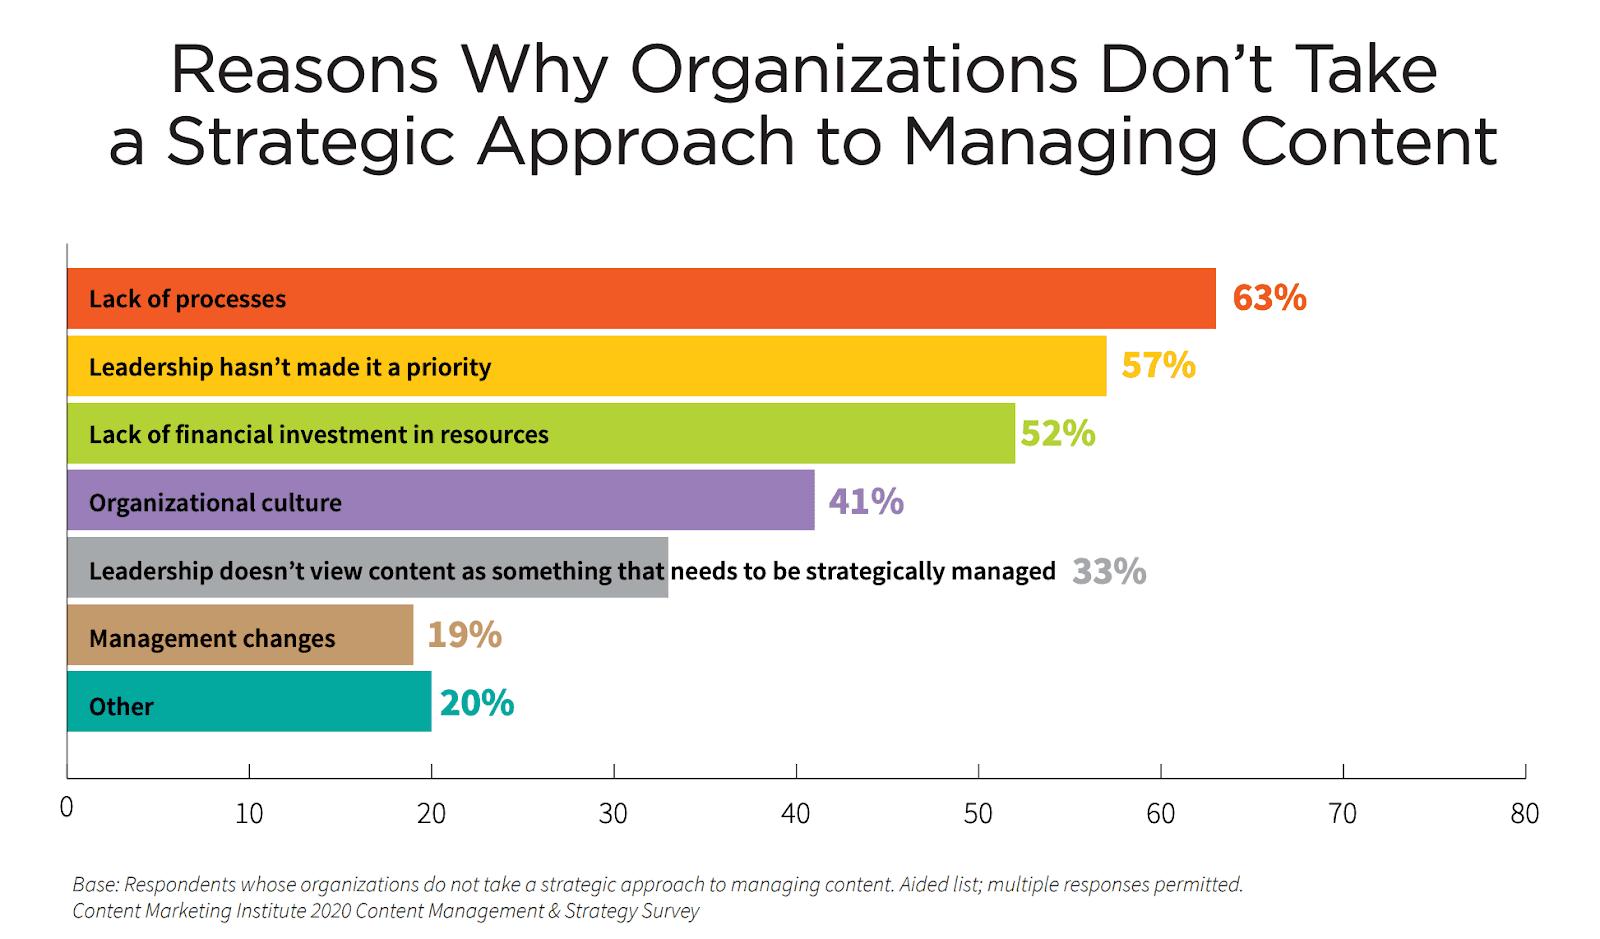 Why organizations don't take a strategic approach